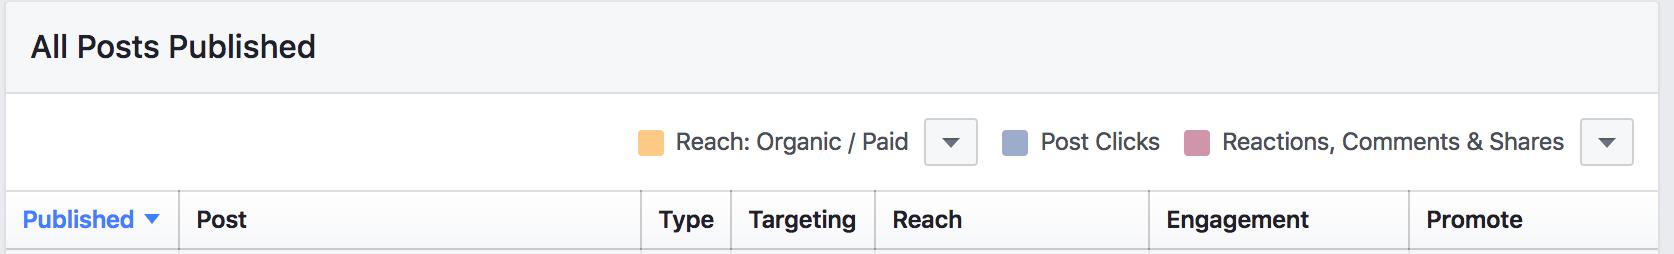 Facebook Insights - נתוני שימוש בפייסבוק - פוסטים